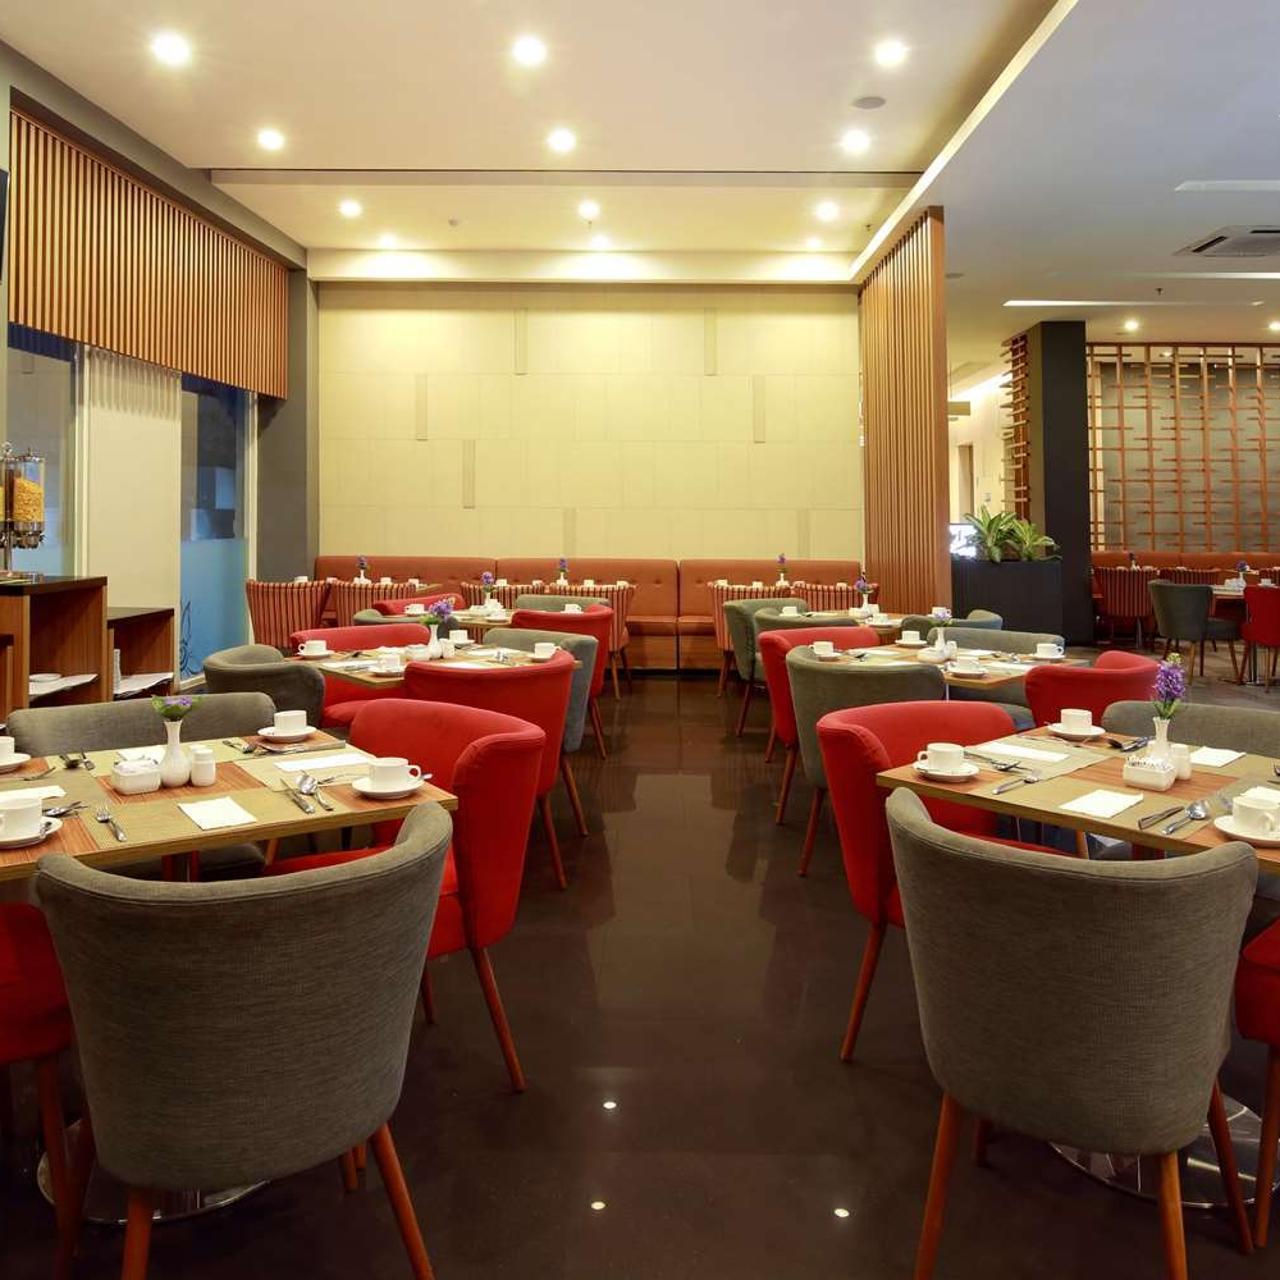 Kyriad Hotel Airport Jakarta 3 Hrs Star Hotel In Tangerang Banten